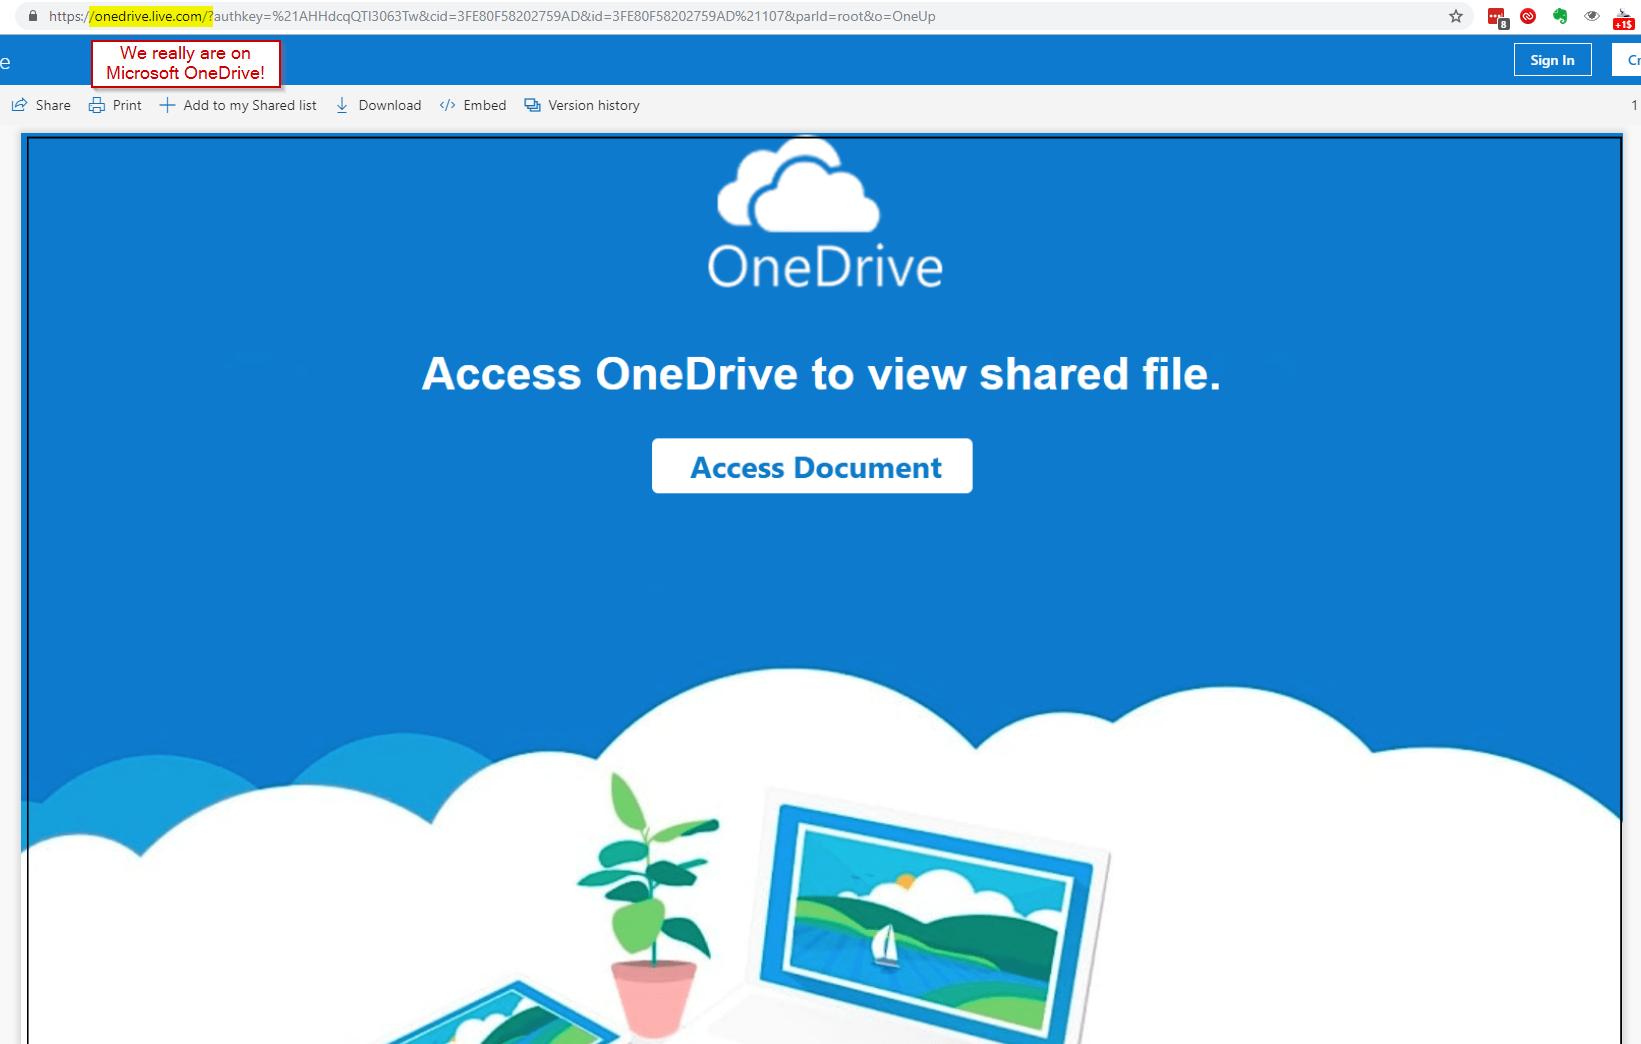 OneDrive Phishing Scam Details